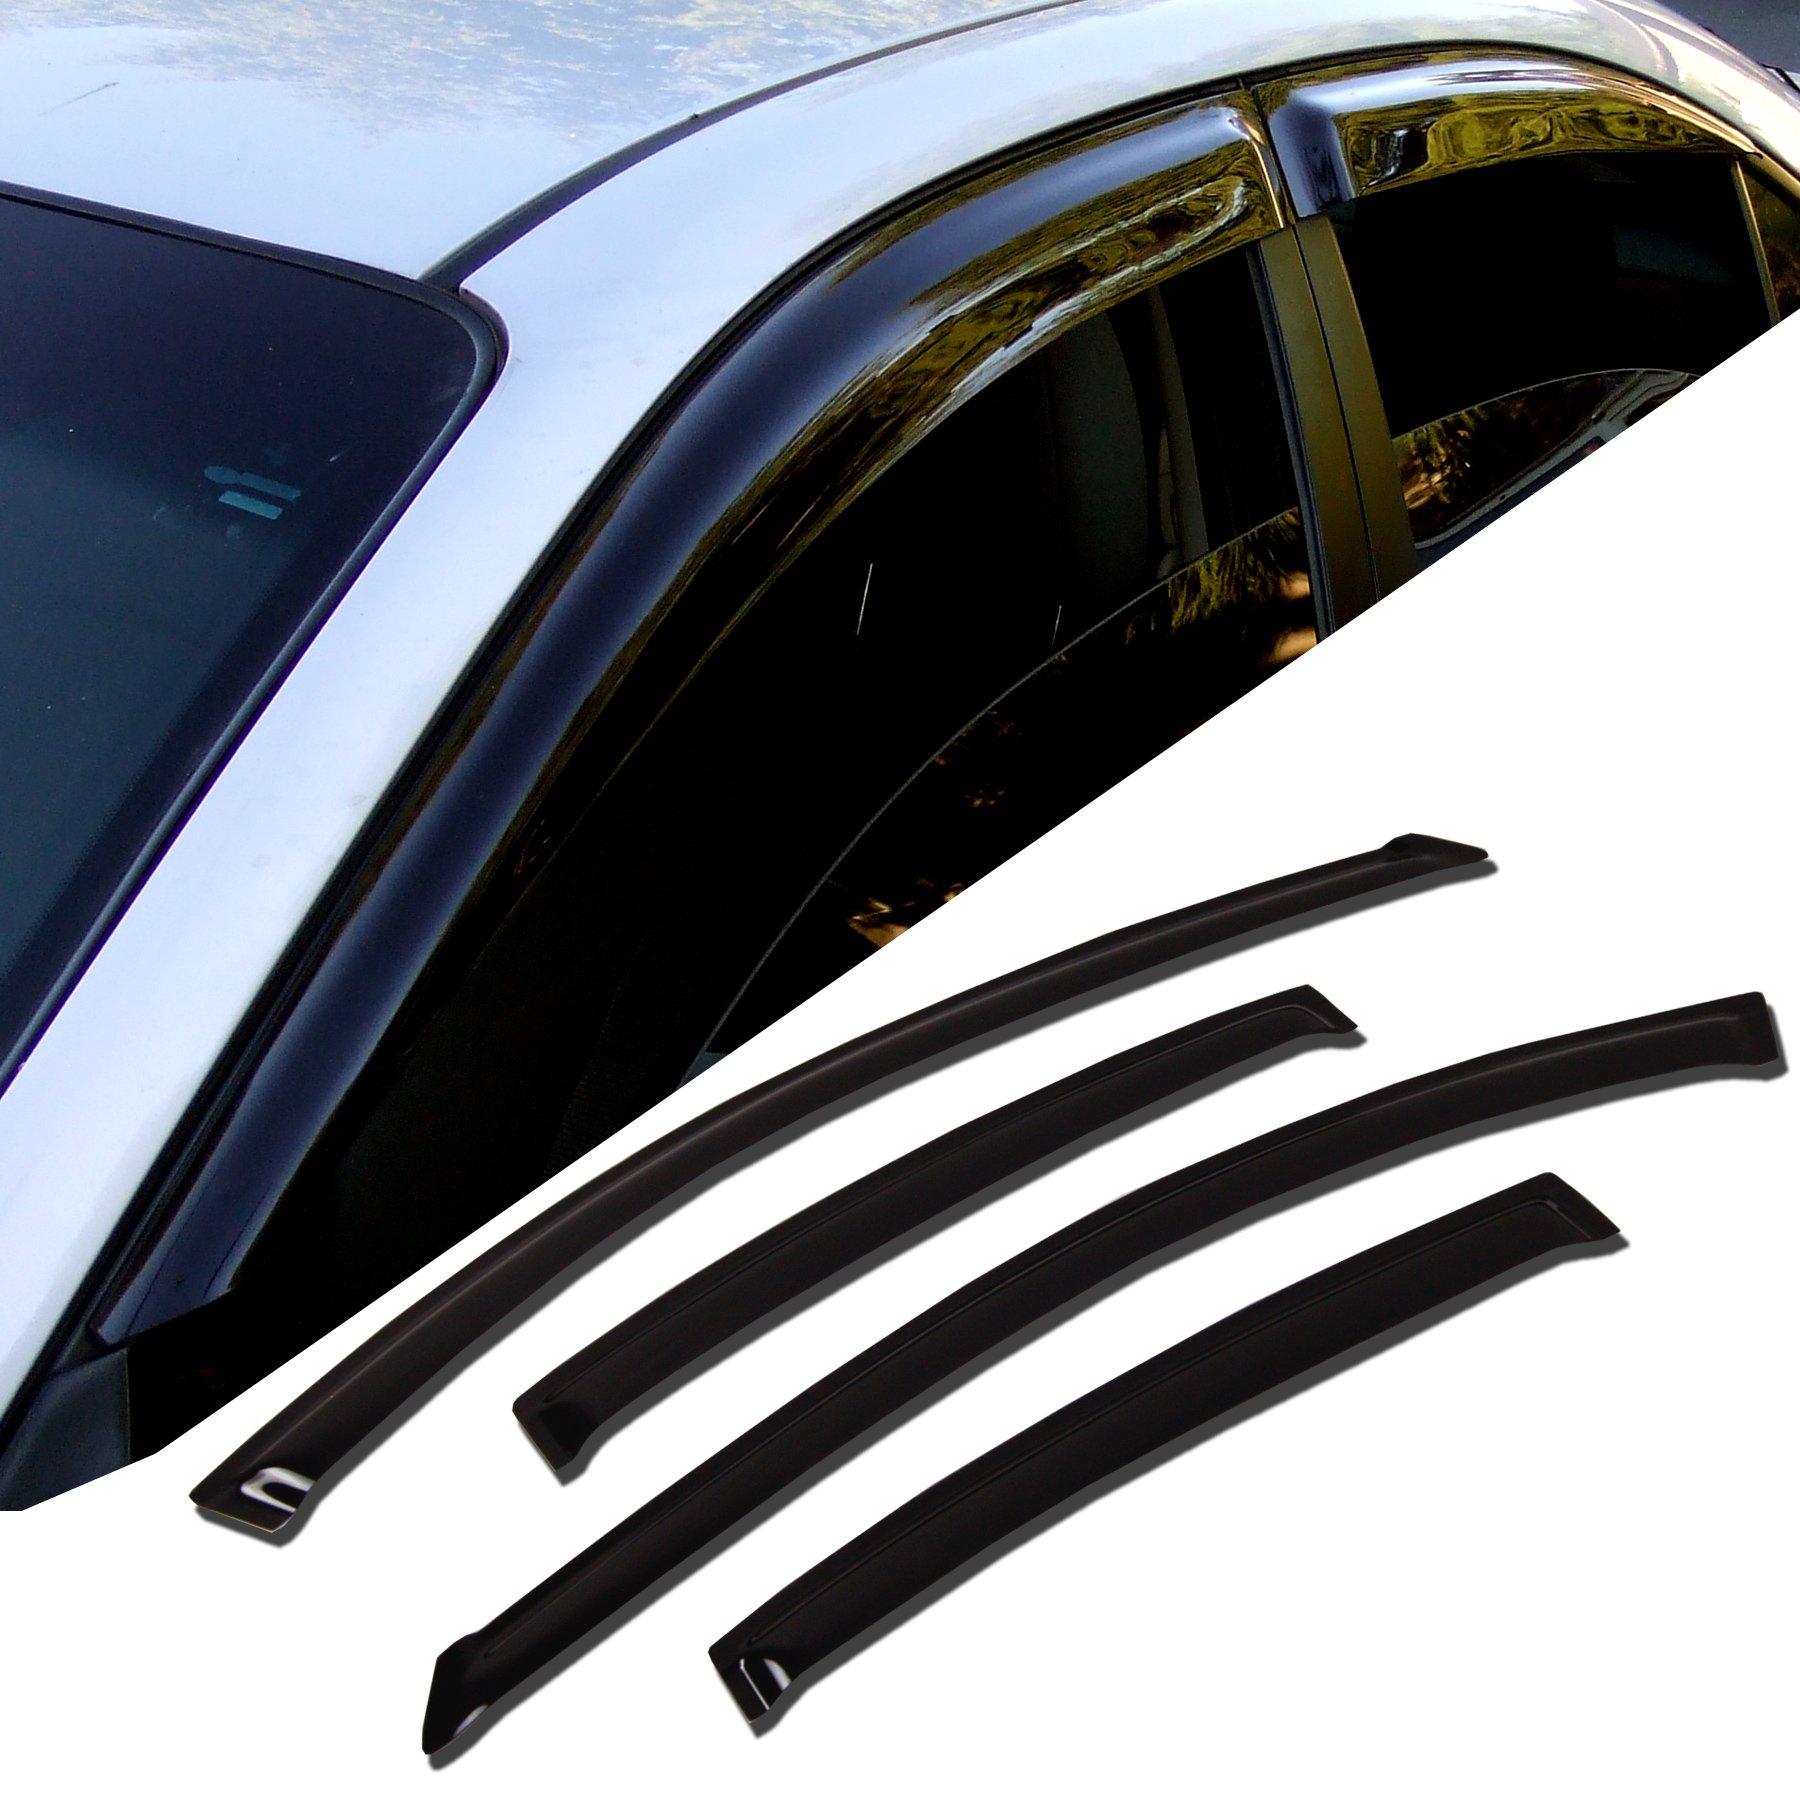 Auto Ventshade 194758 In-Channel Ventvisor Side Window Deflector 4-Piece Set for 2016-2018 Kia Sorento